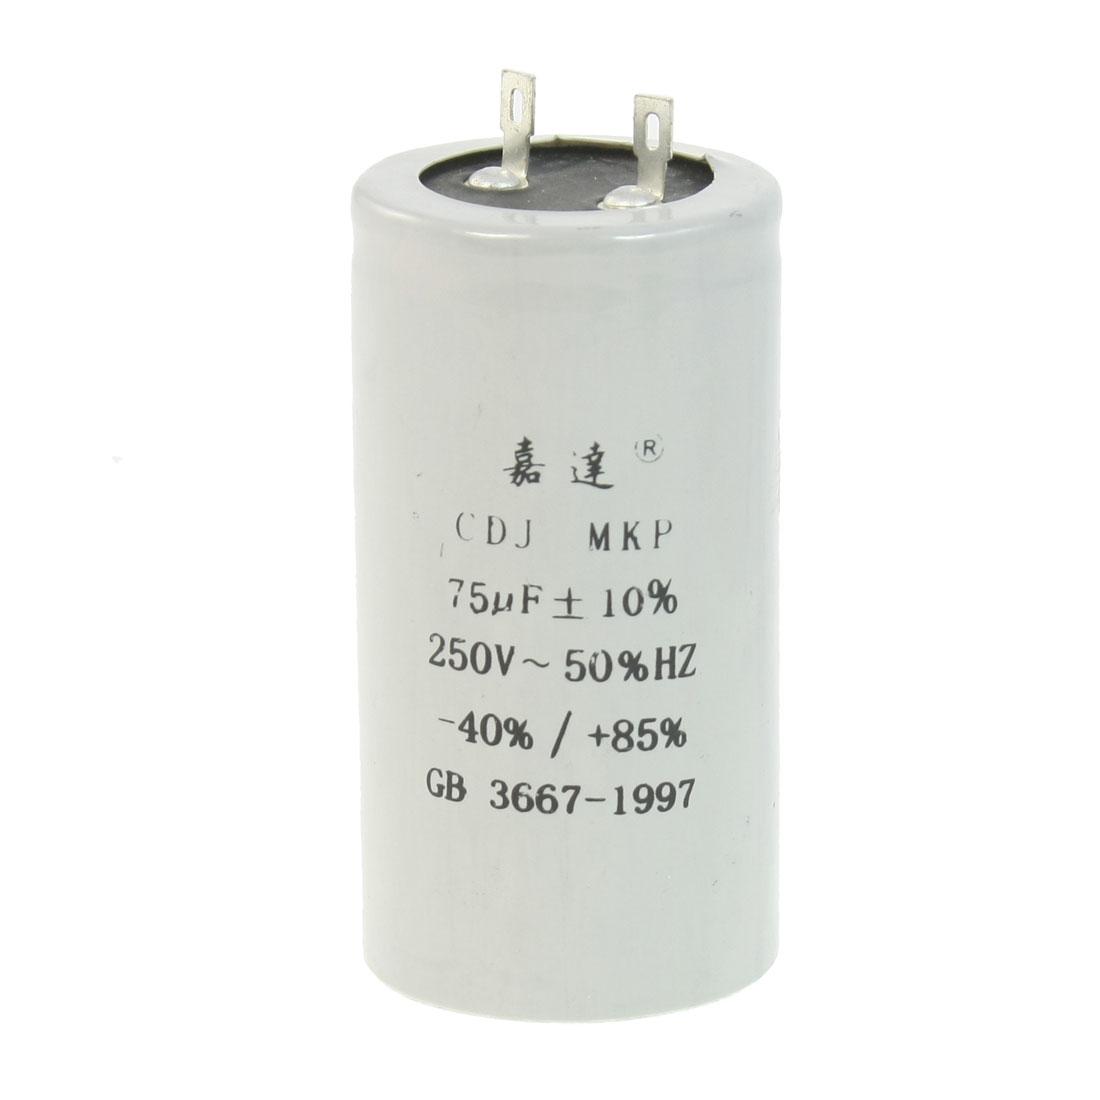 AC 250V 75uF 2 Terminals Non Polar CDJ MKP Motor Starting Capacitor